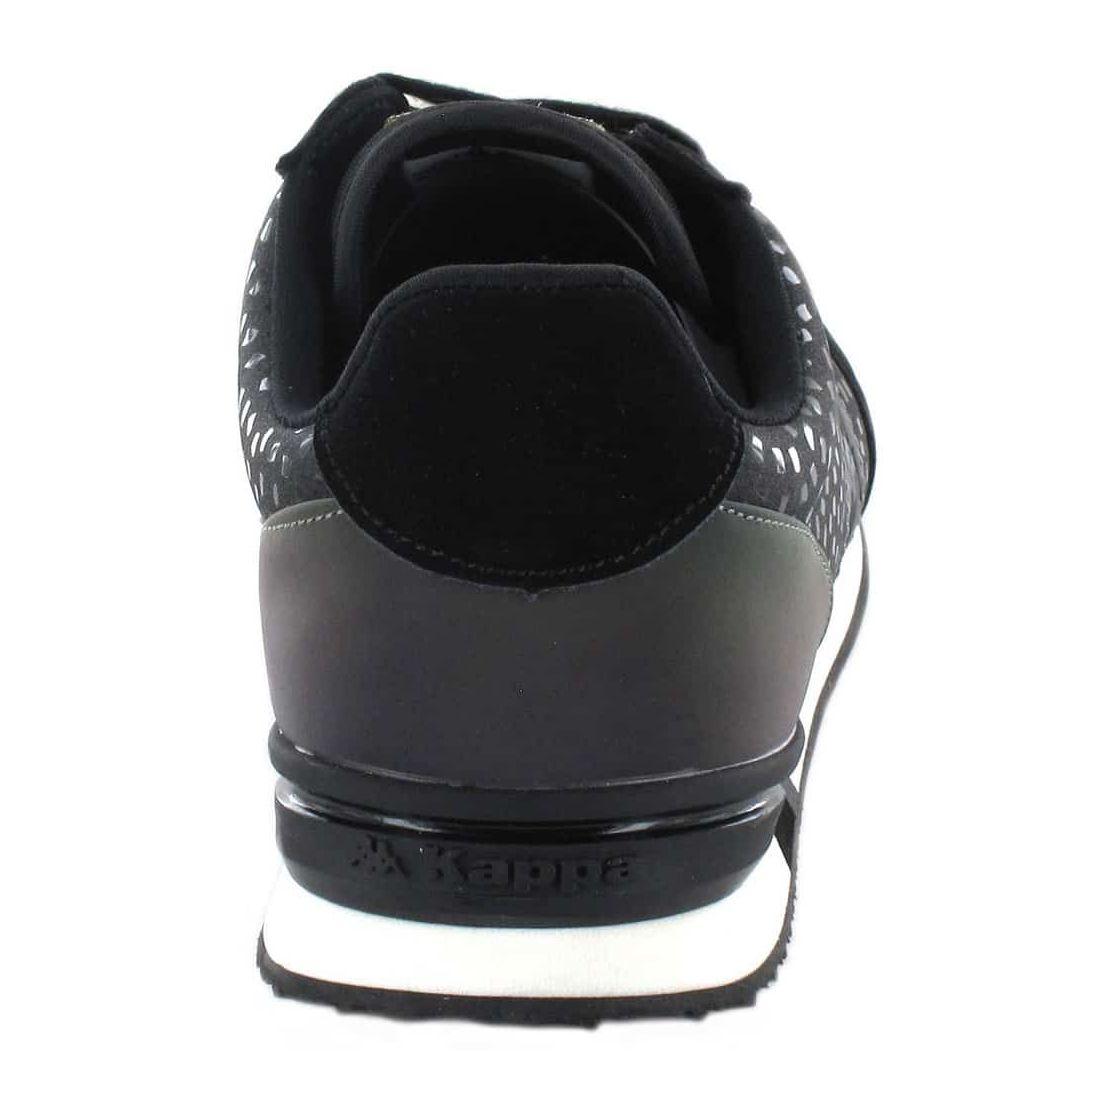 Calzado Casual Mujer - Kappa Mohan Negro negro Lifestyle